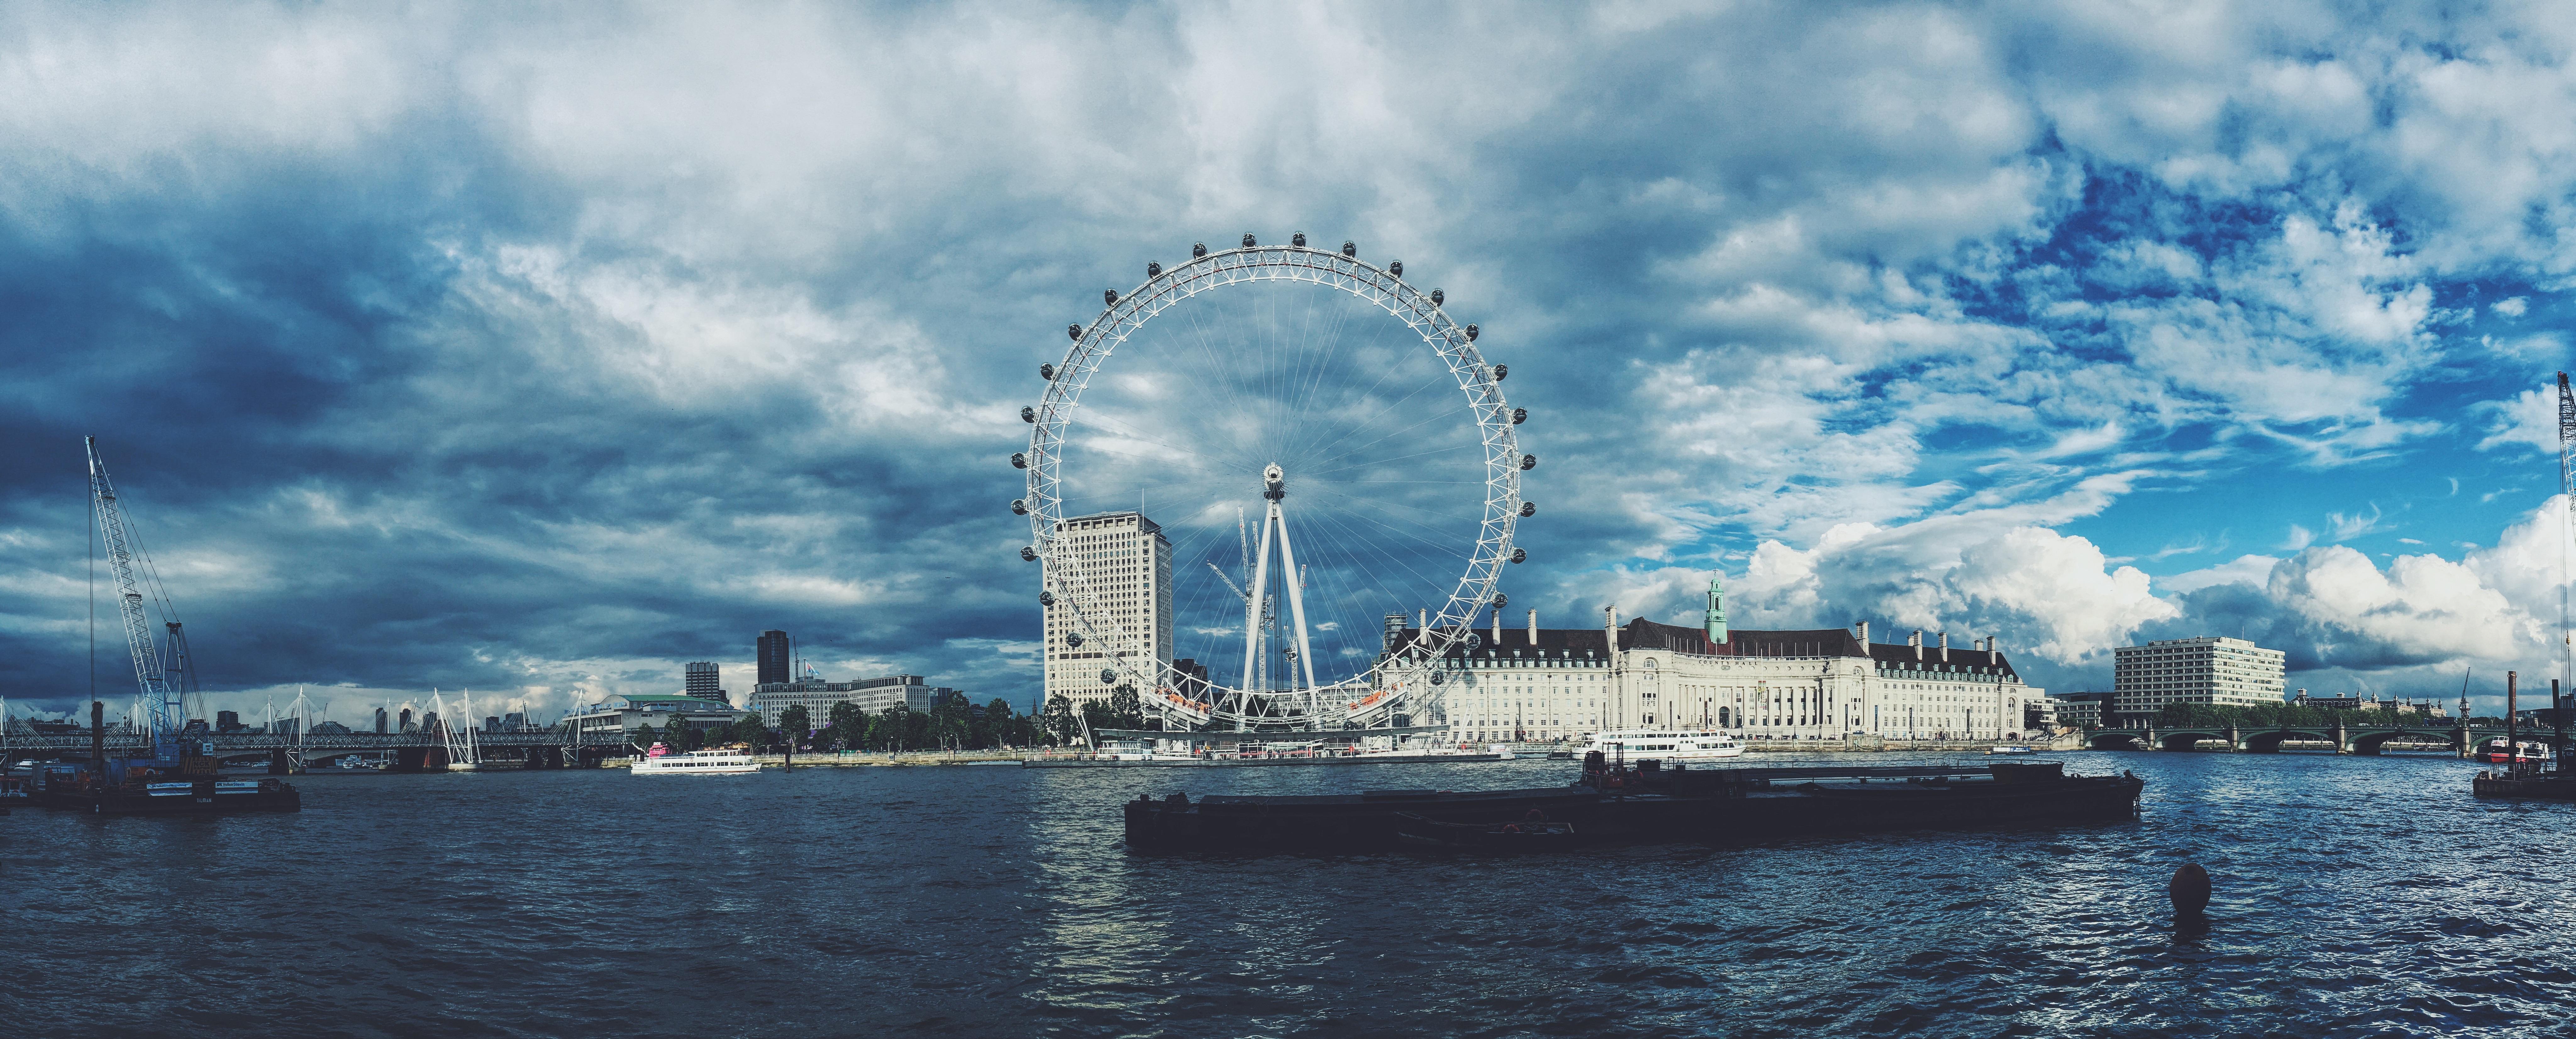 image-2-london